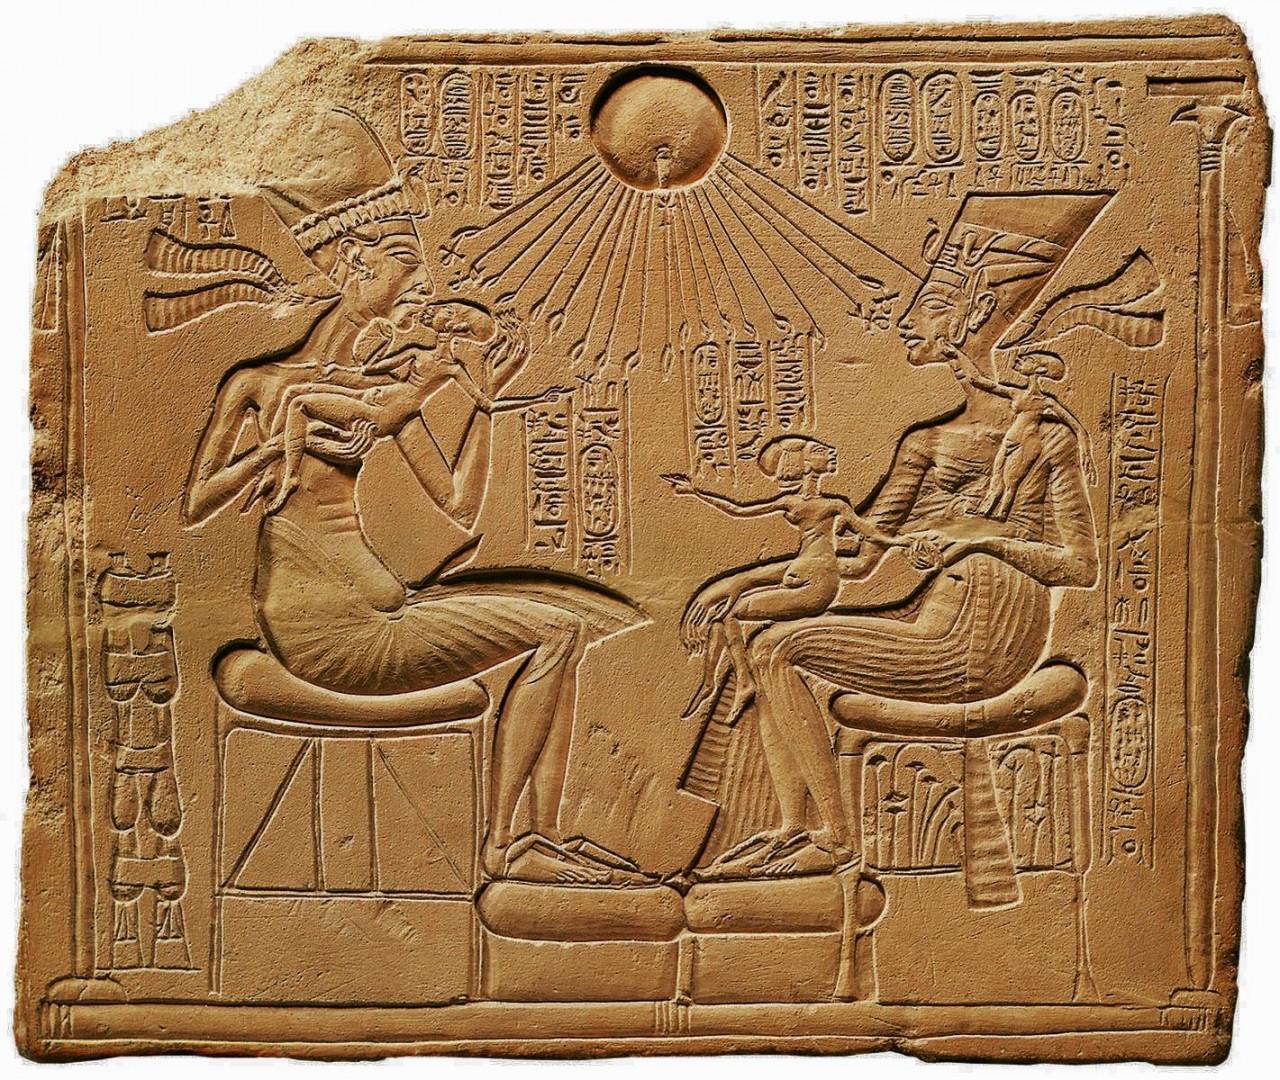 the counter culture and akhenaten